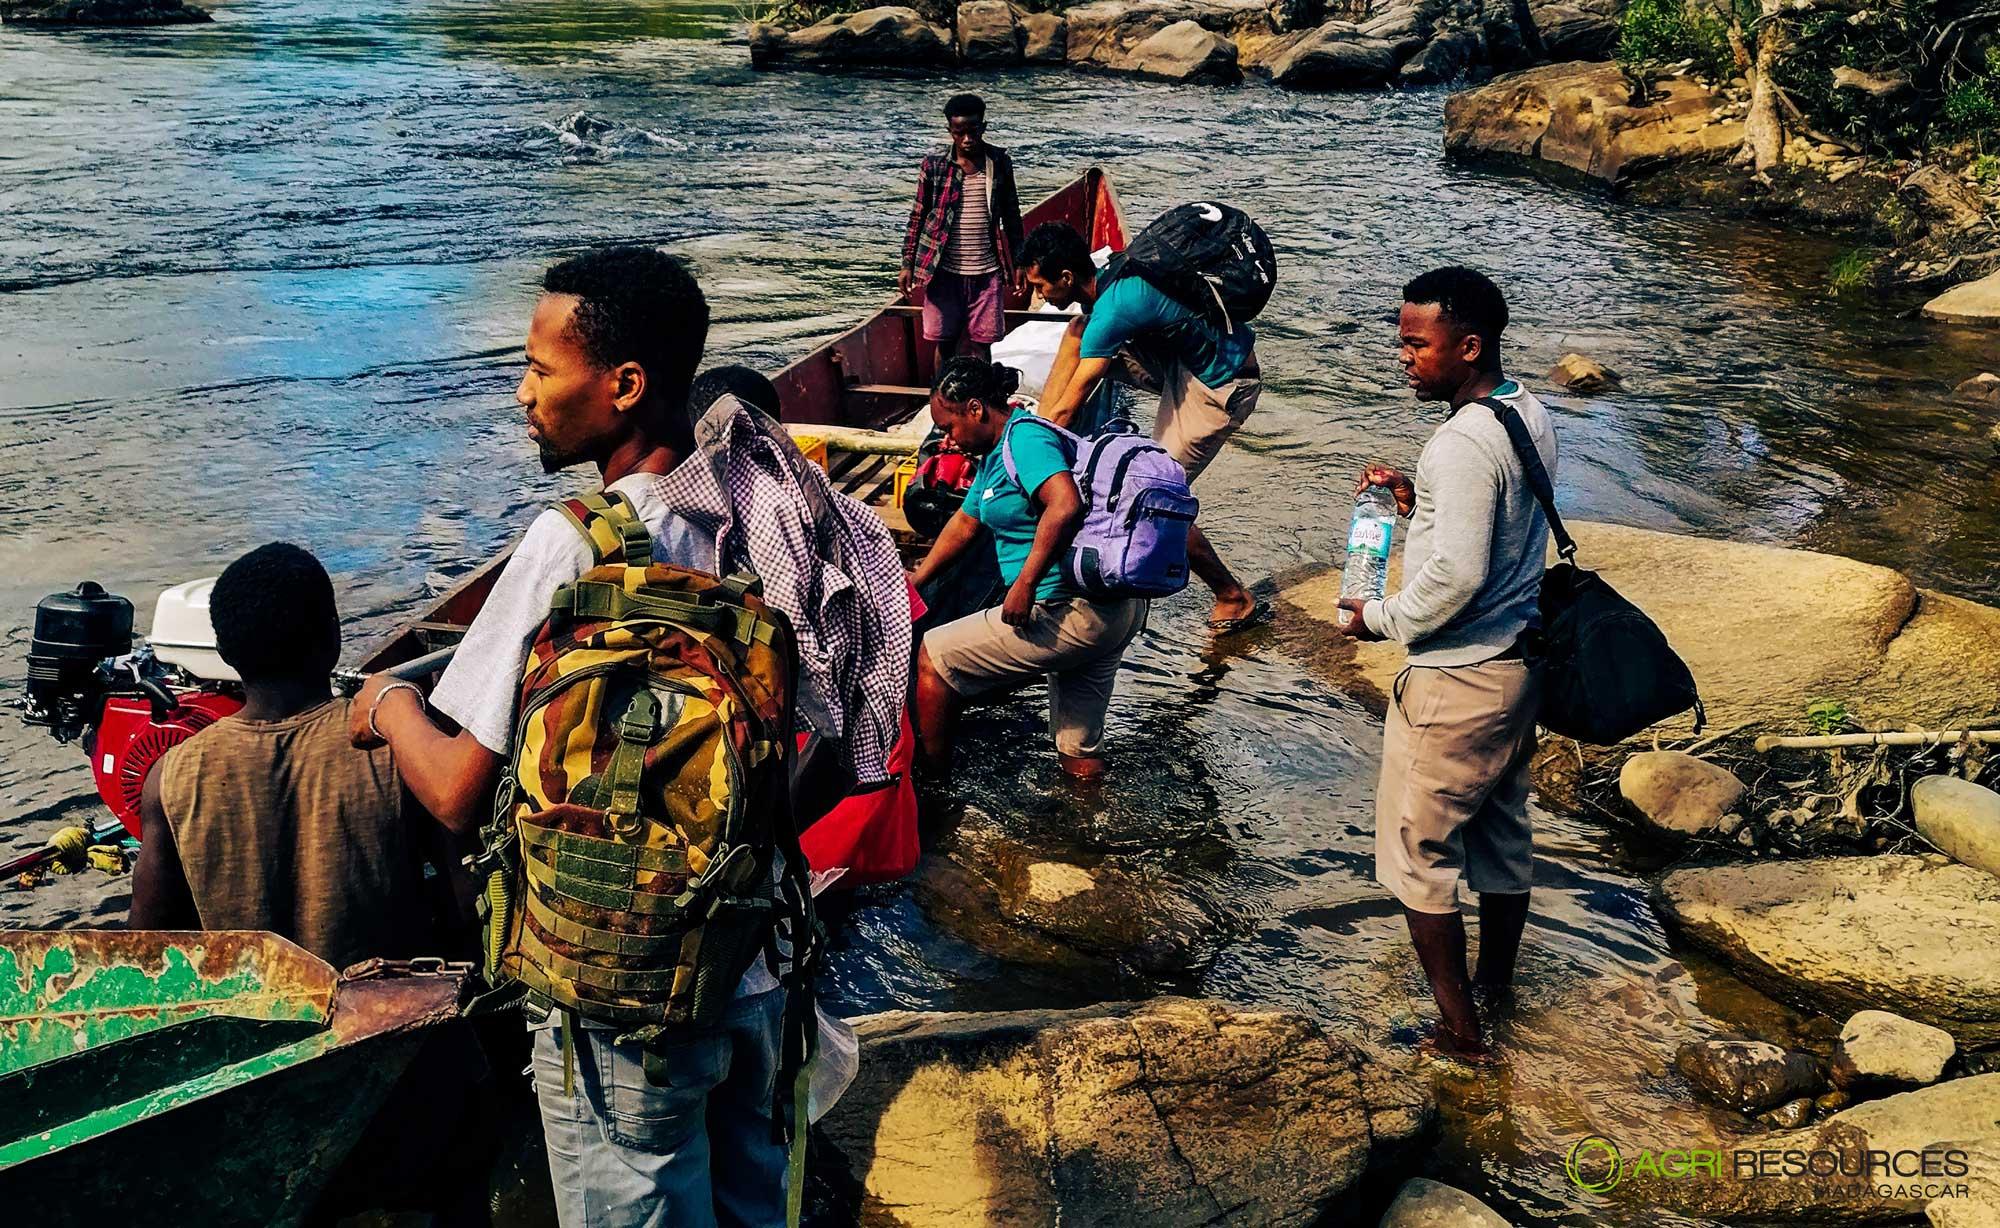 Green-Vanilla-Campaign-2021---Agri-Resources-Madagascar-3